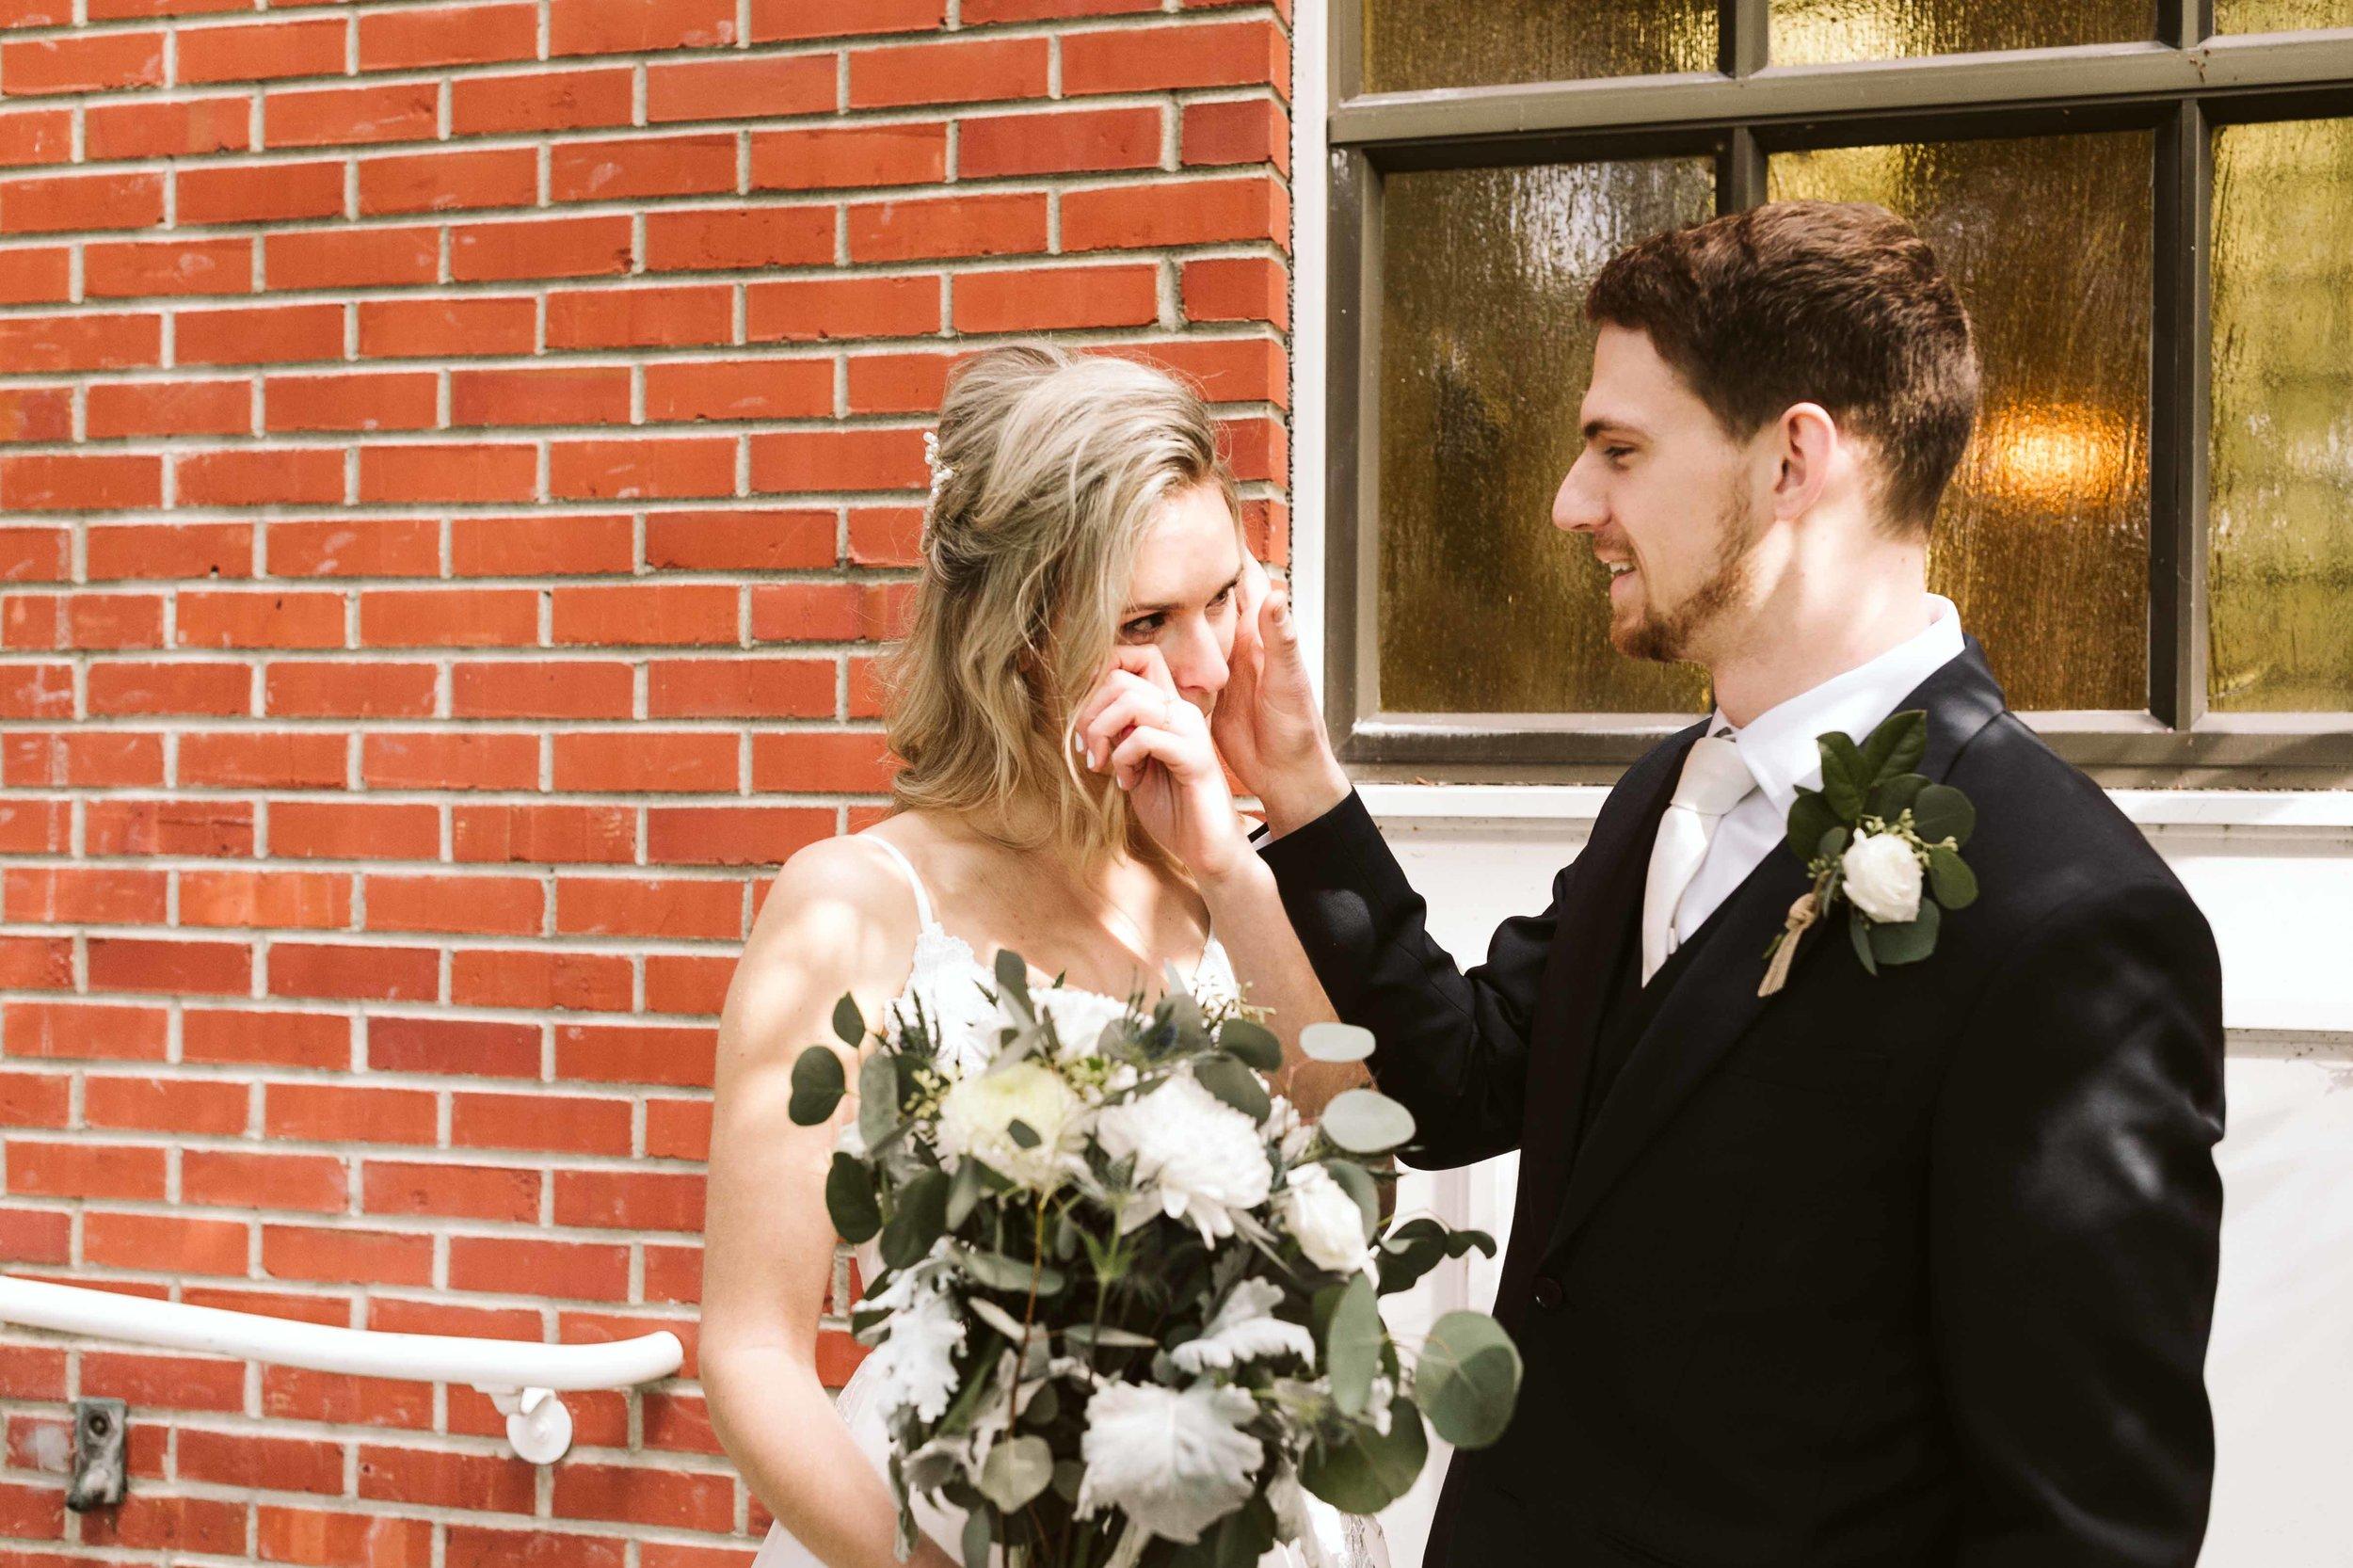 kilworth-memorial-chapel-wedding-26.jpg